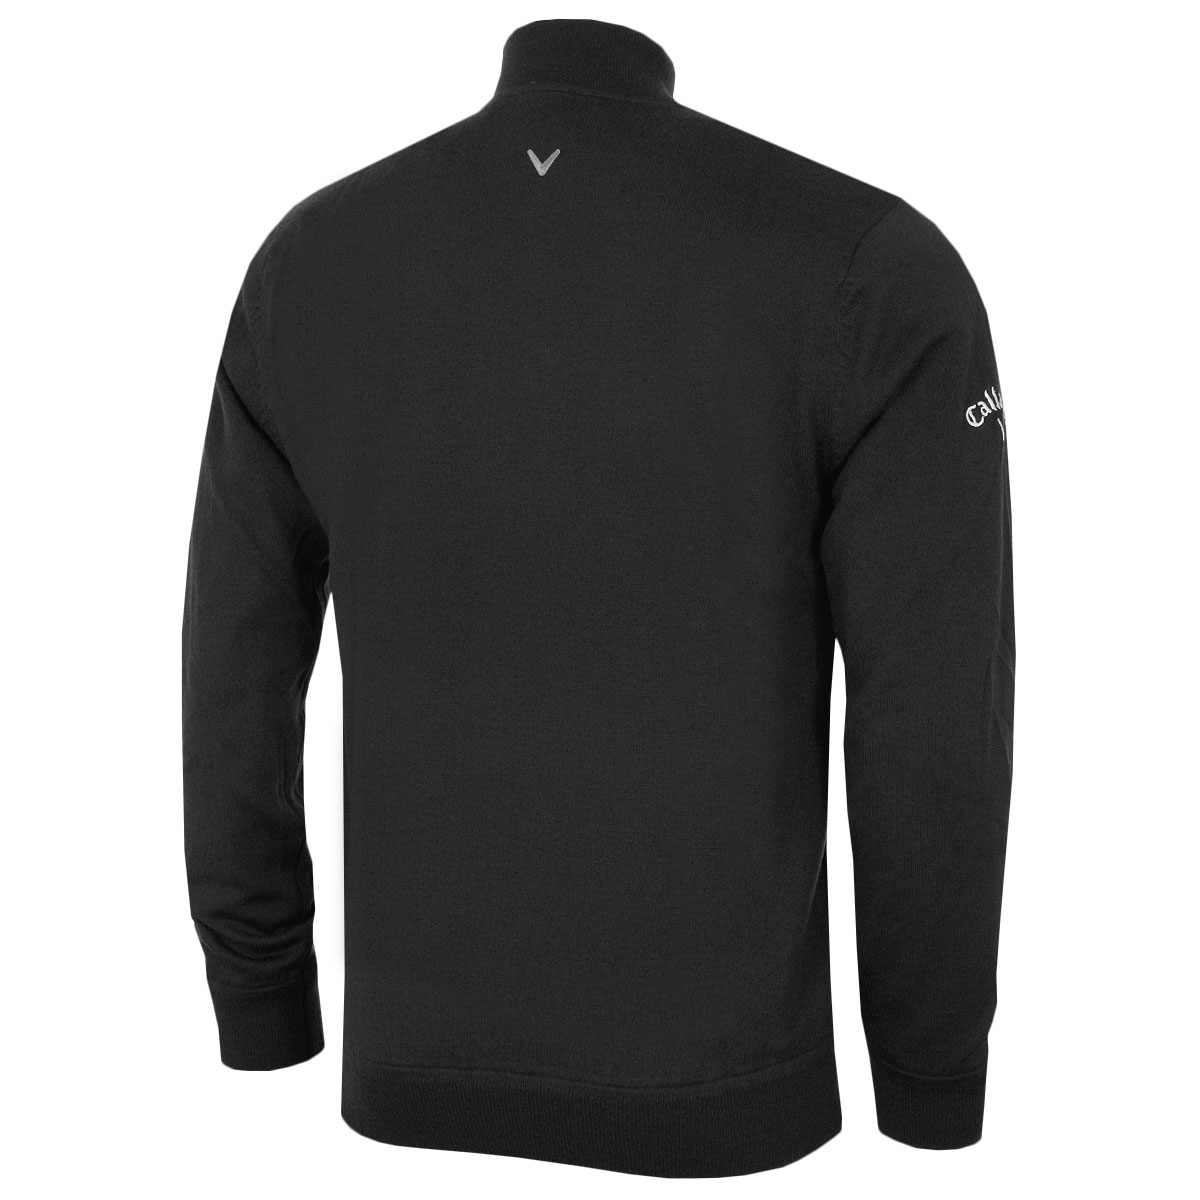 Callaway-Golf-Mens-1-4-Zip-Mock-Merino-Windproof-Sweater-Pullover-49-OFF-RRP thumbnail 4